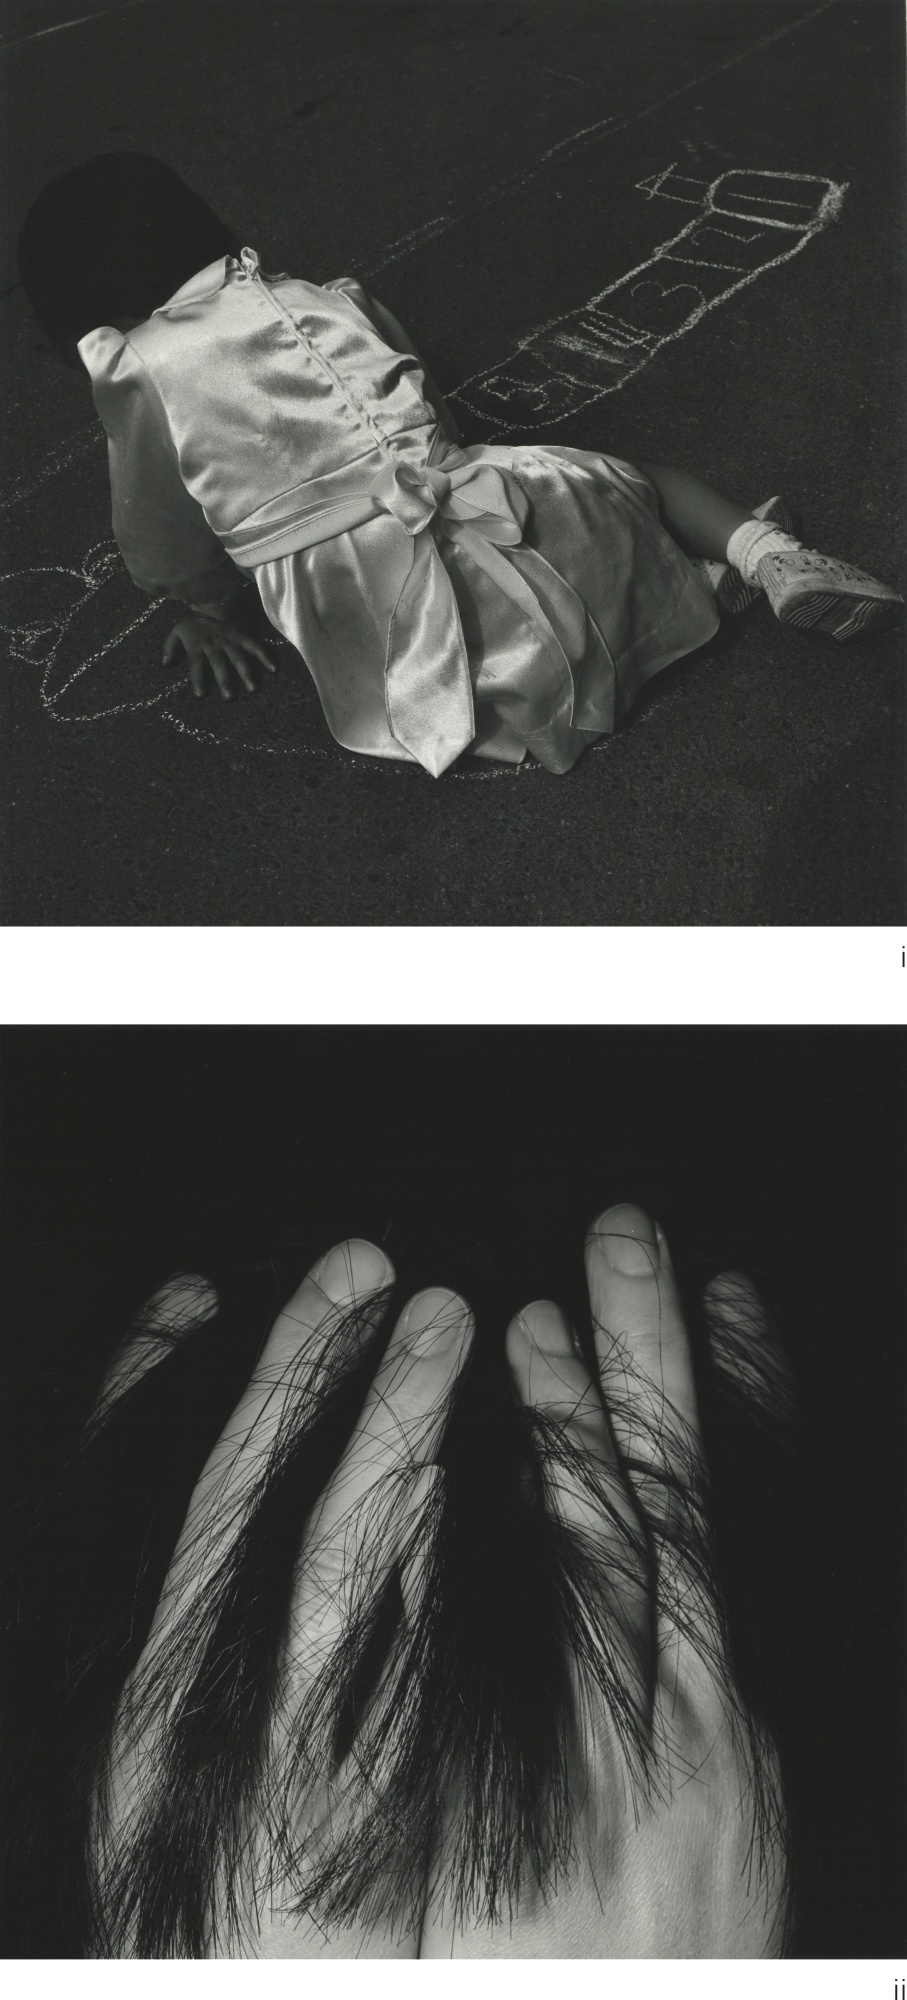 Issei Suda-(i) Fushikaden Mie Nabari (ii) Fushikaden Tokyo Kanda (Two Works)-1977